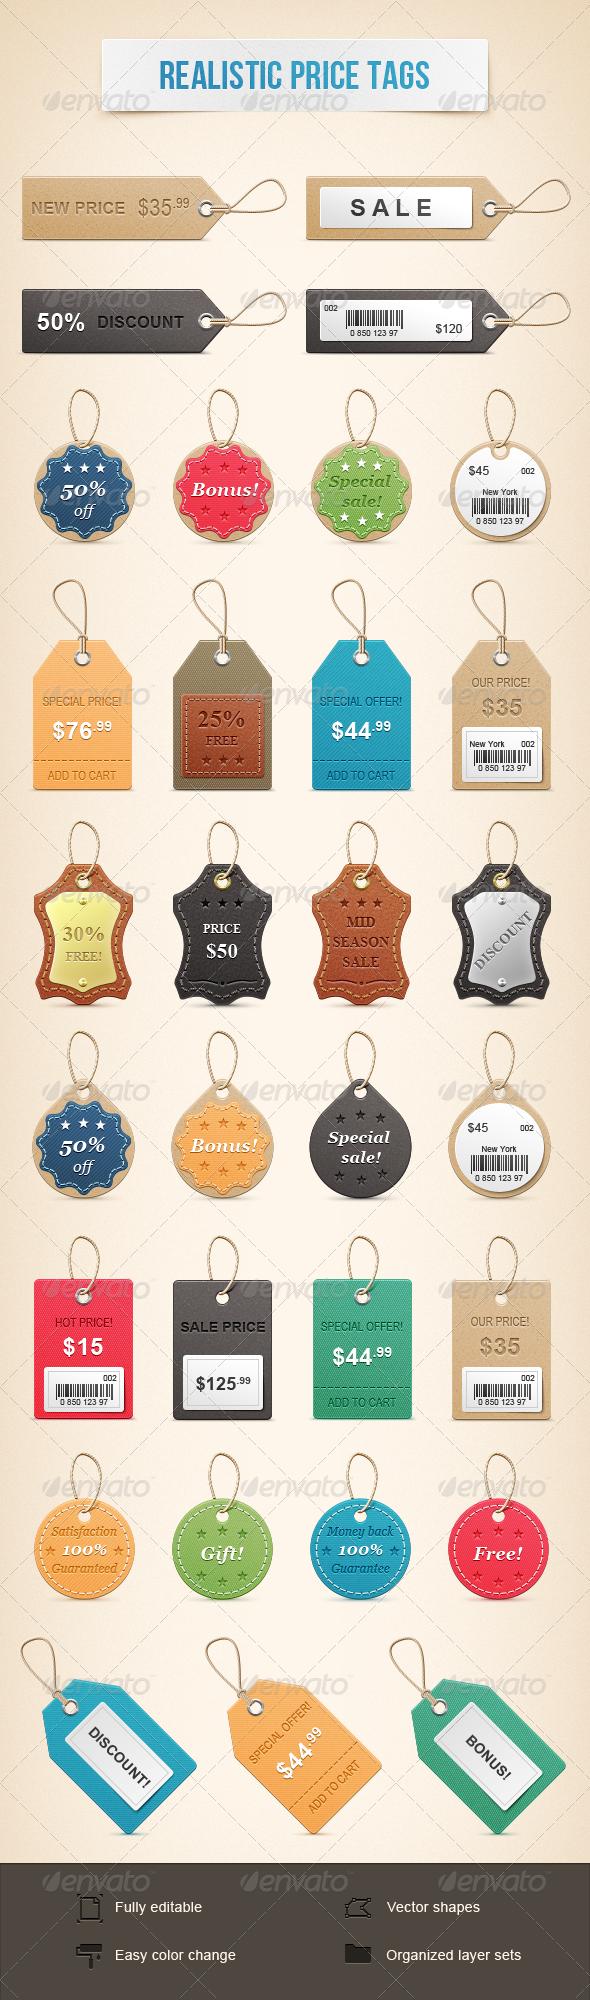 GraphicRiver Realistic Price Tags 1647201